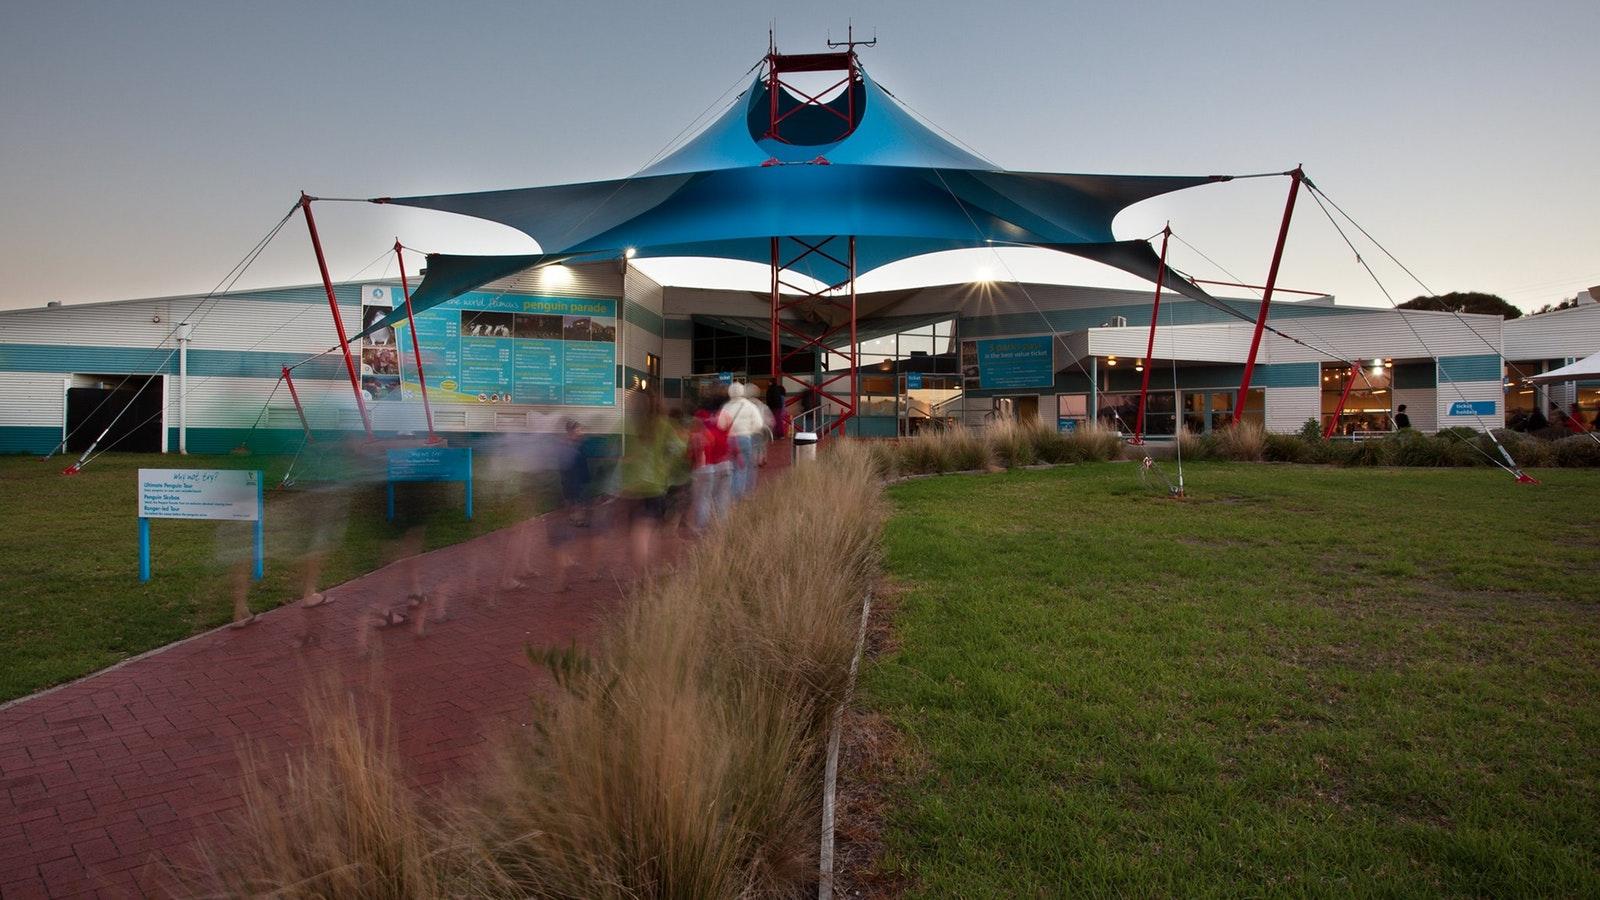 Phillip Island Nature Parks Visitor Information Centre, home to 32,000 penguins